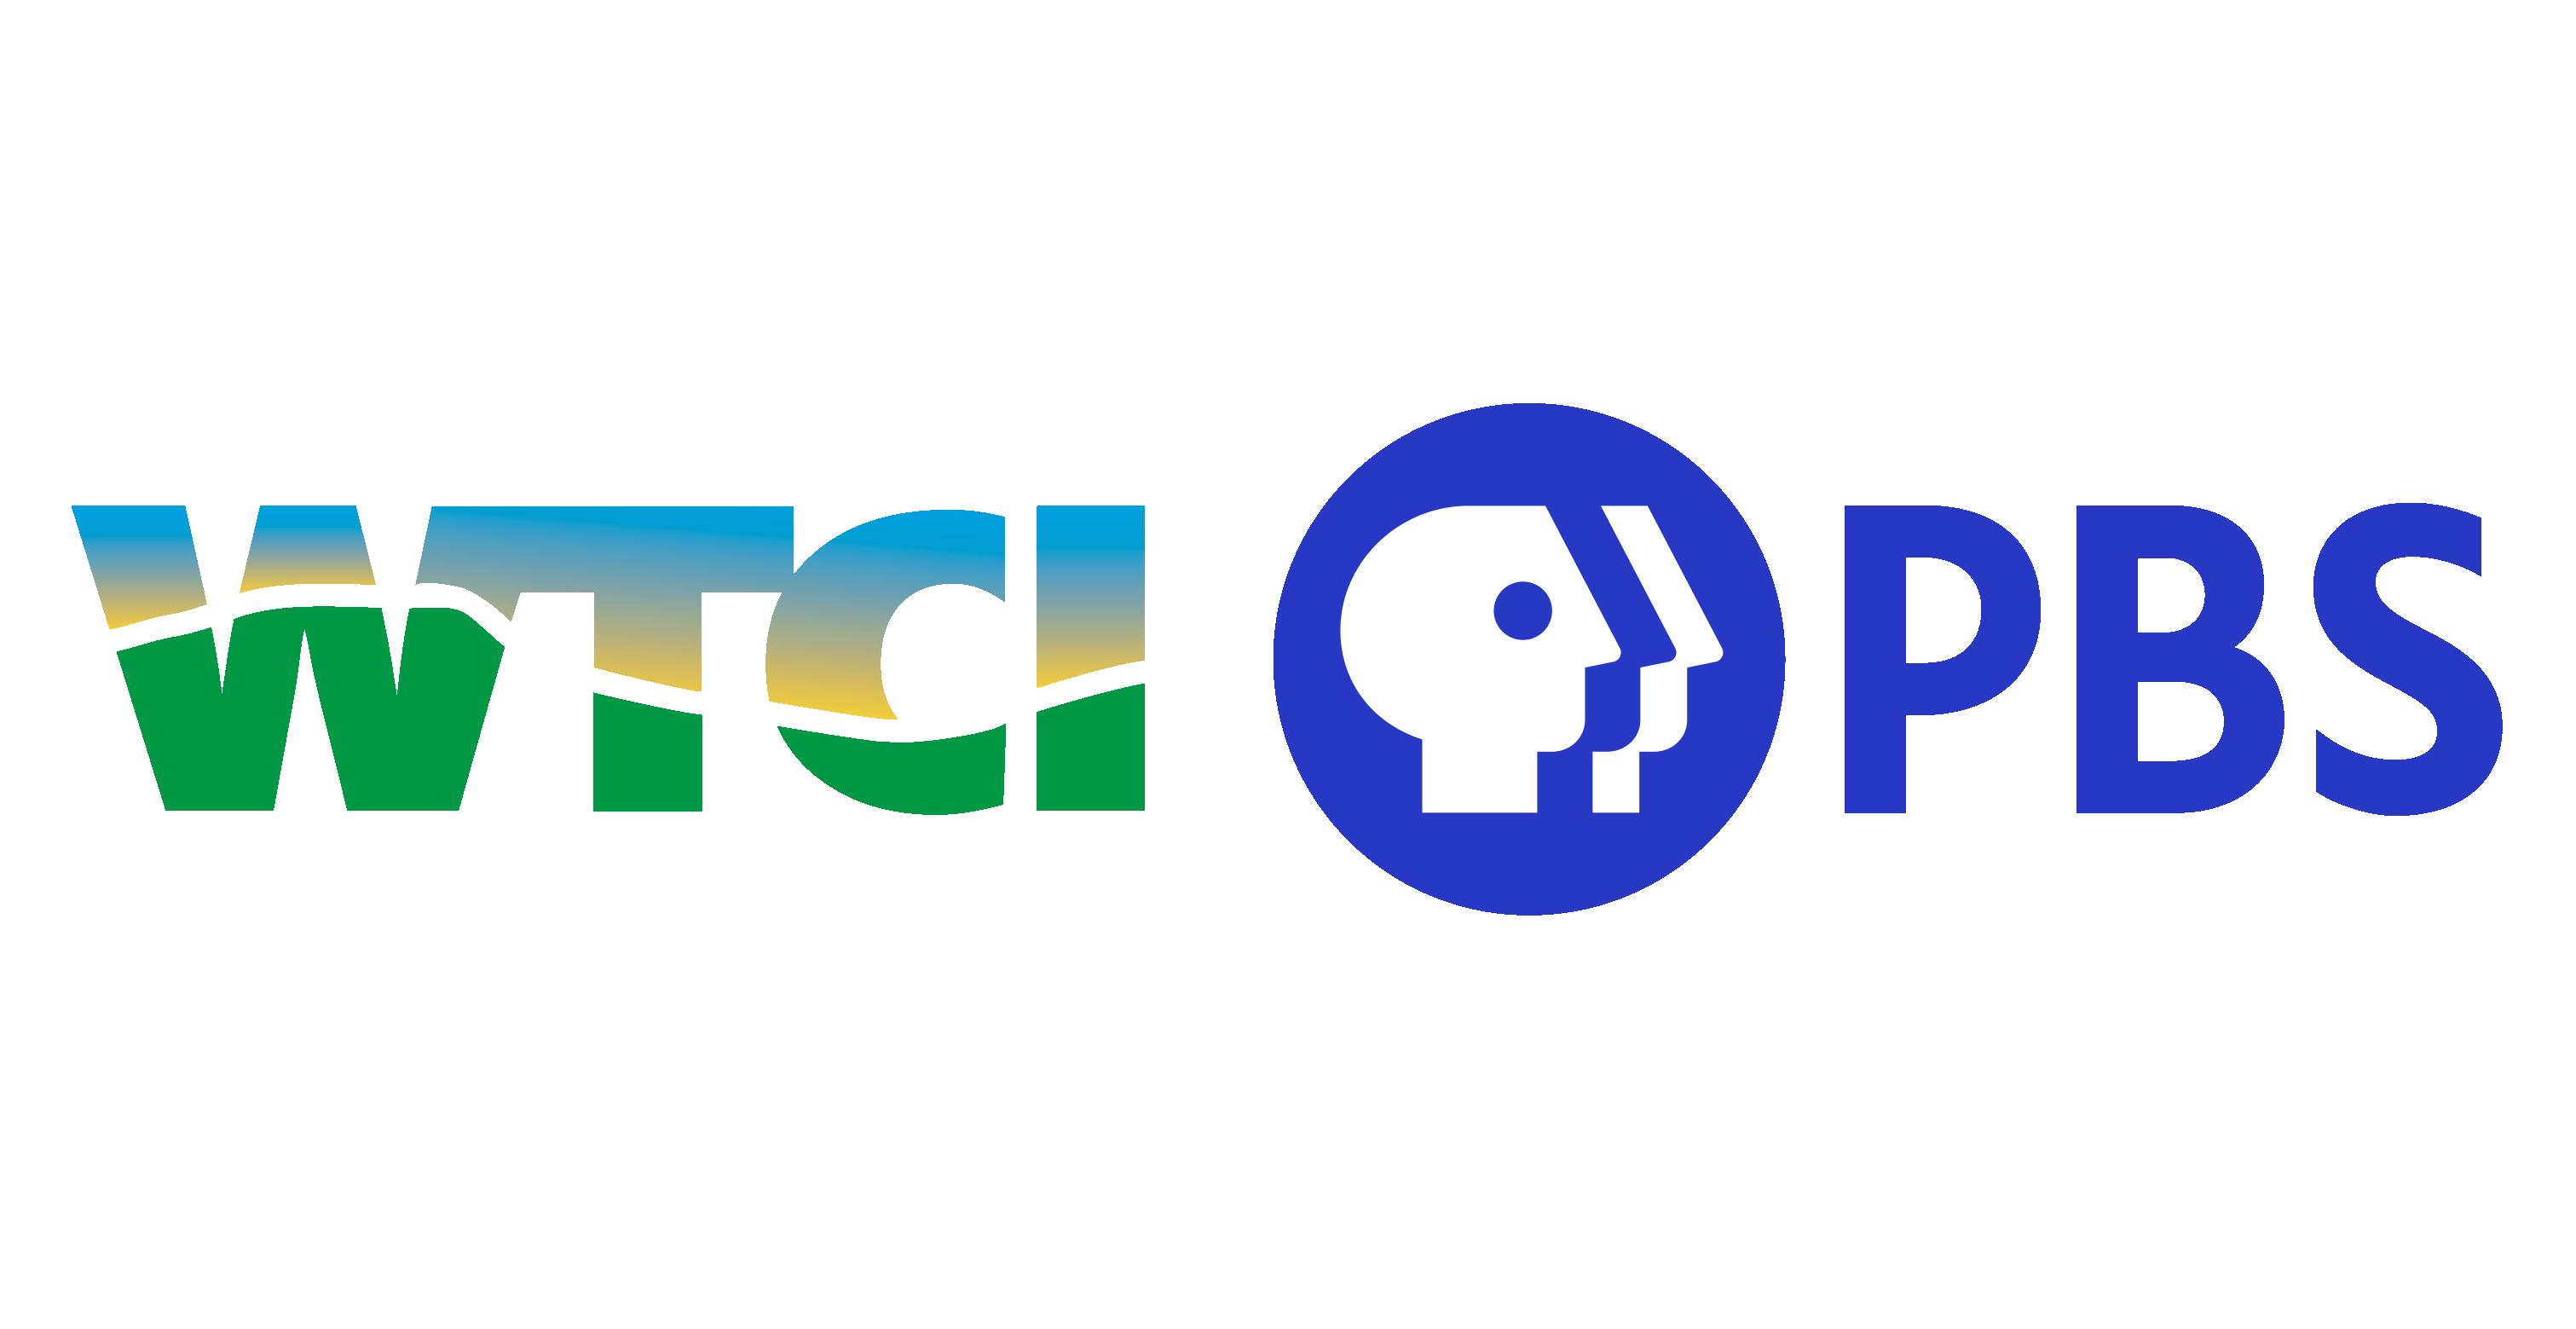 WTCI PBS